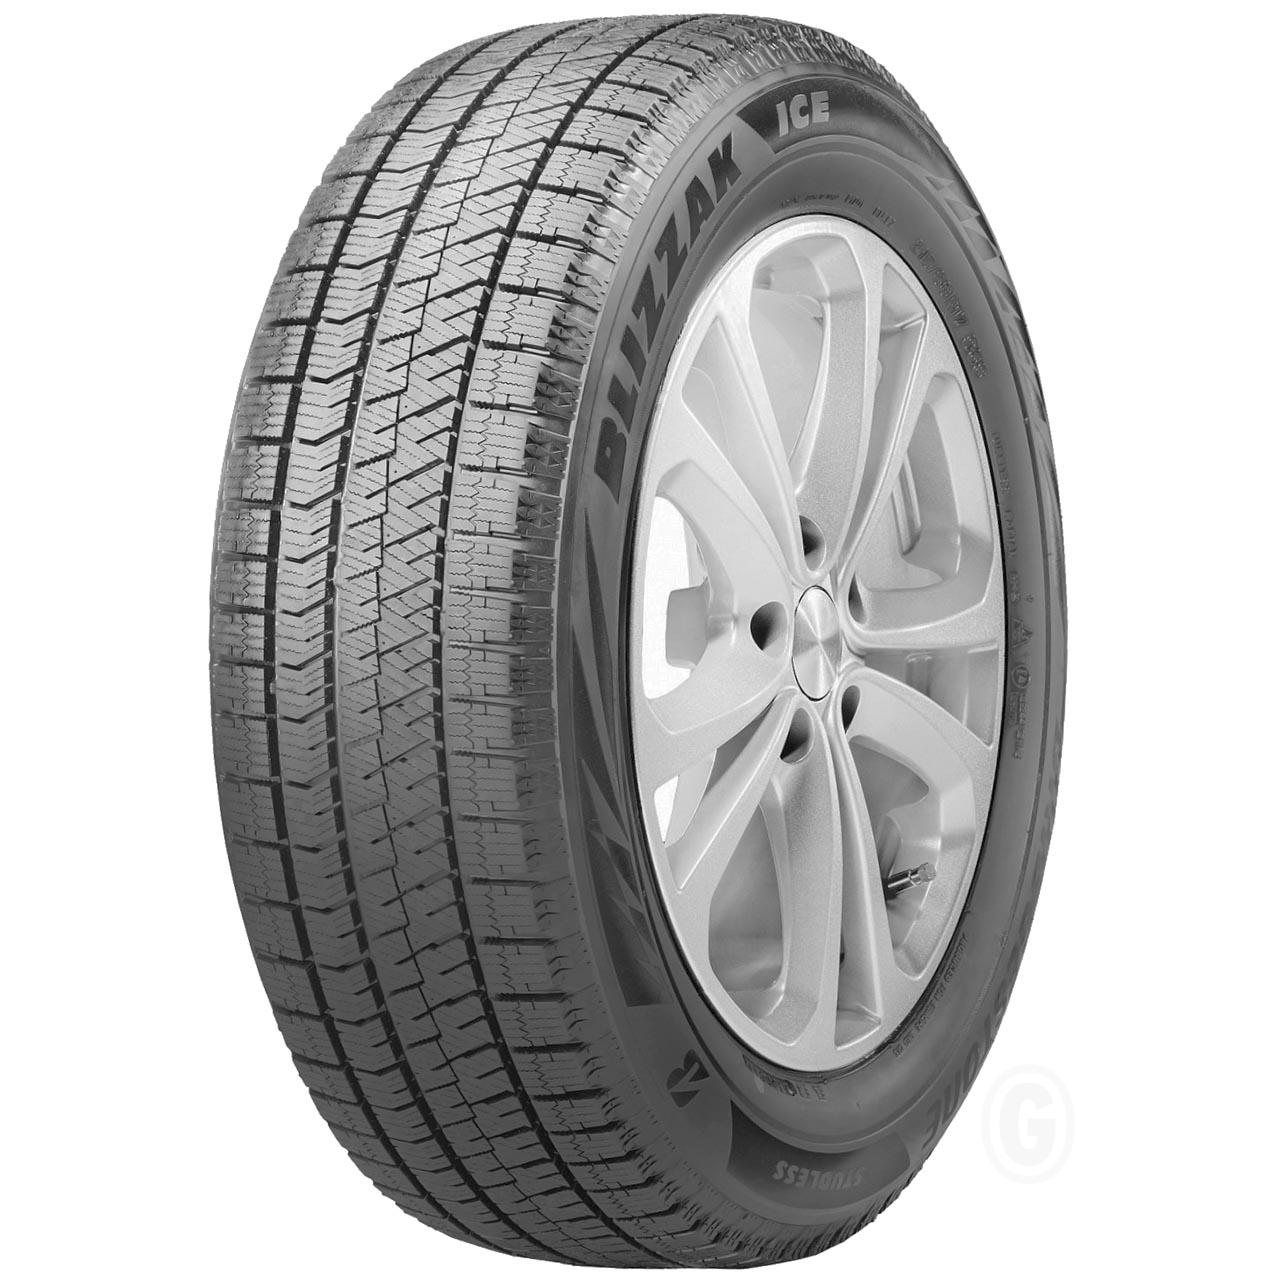 Bridgestone Blizzak ICE 235/45R17 97S XL SOFT COMPOUND